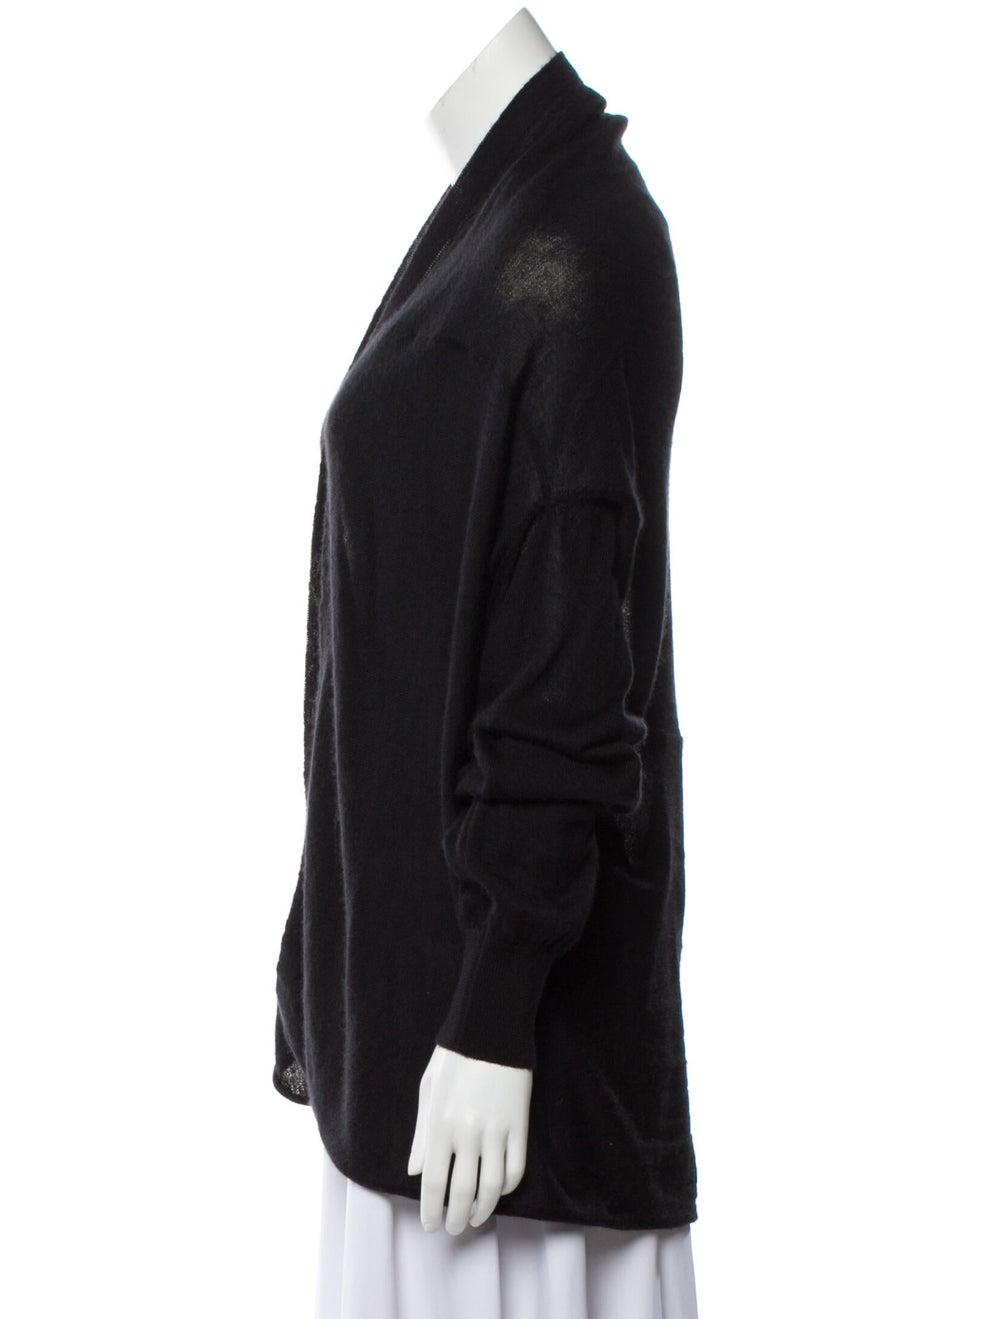 Dolce & Gabbana Cashmere and Silk-Blend Knit Black - image 2